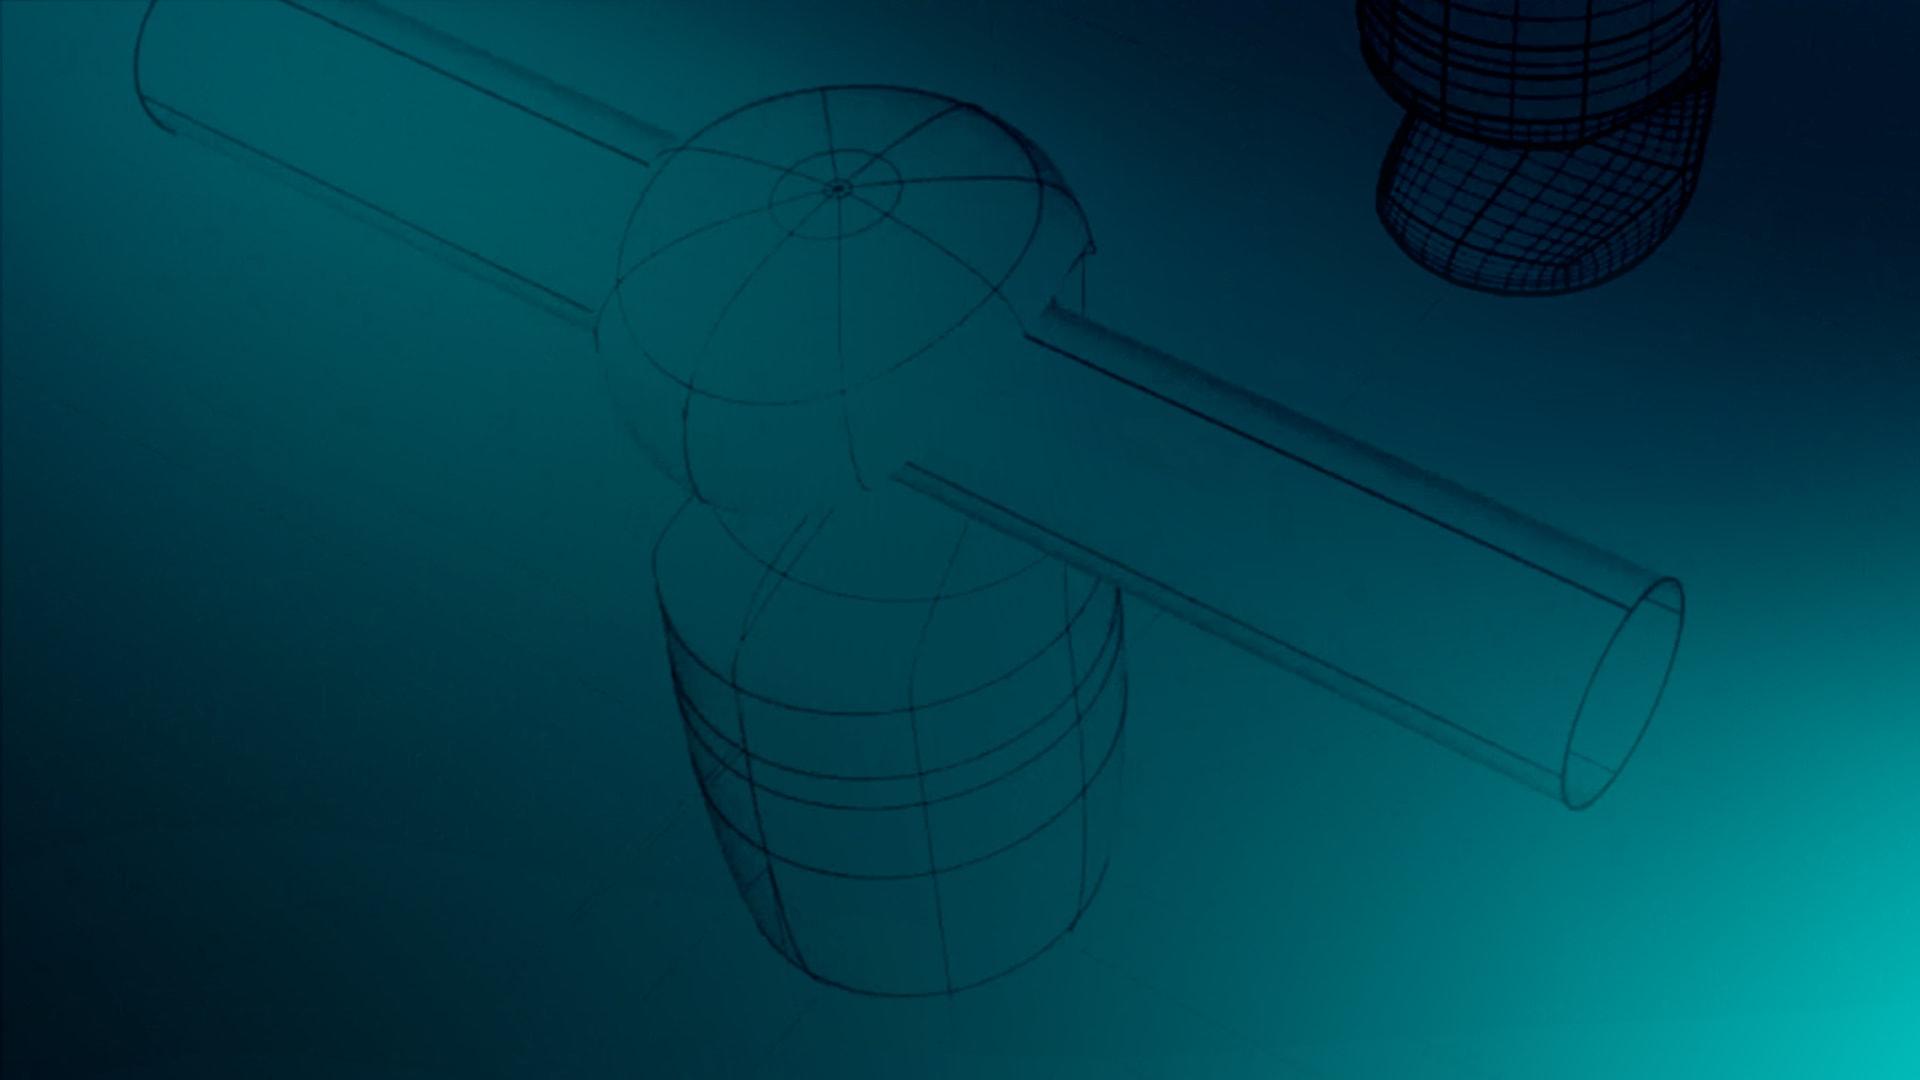 engeneering drawing on tourquoise background